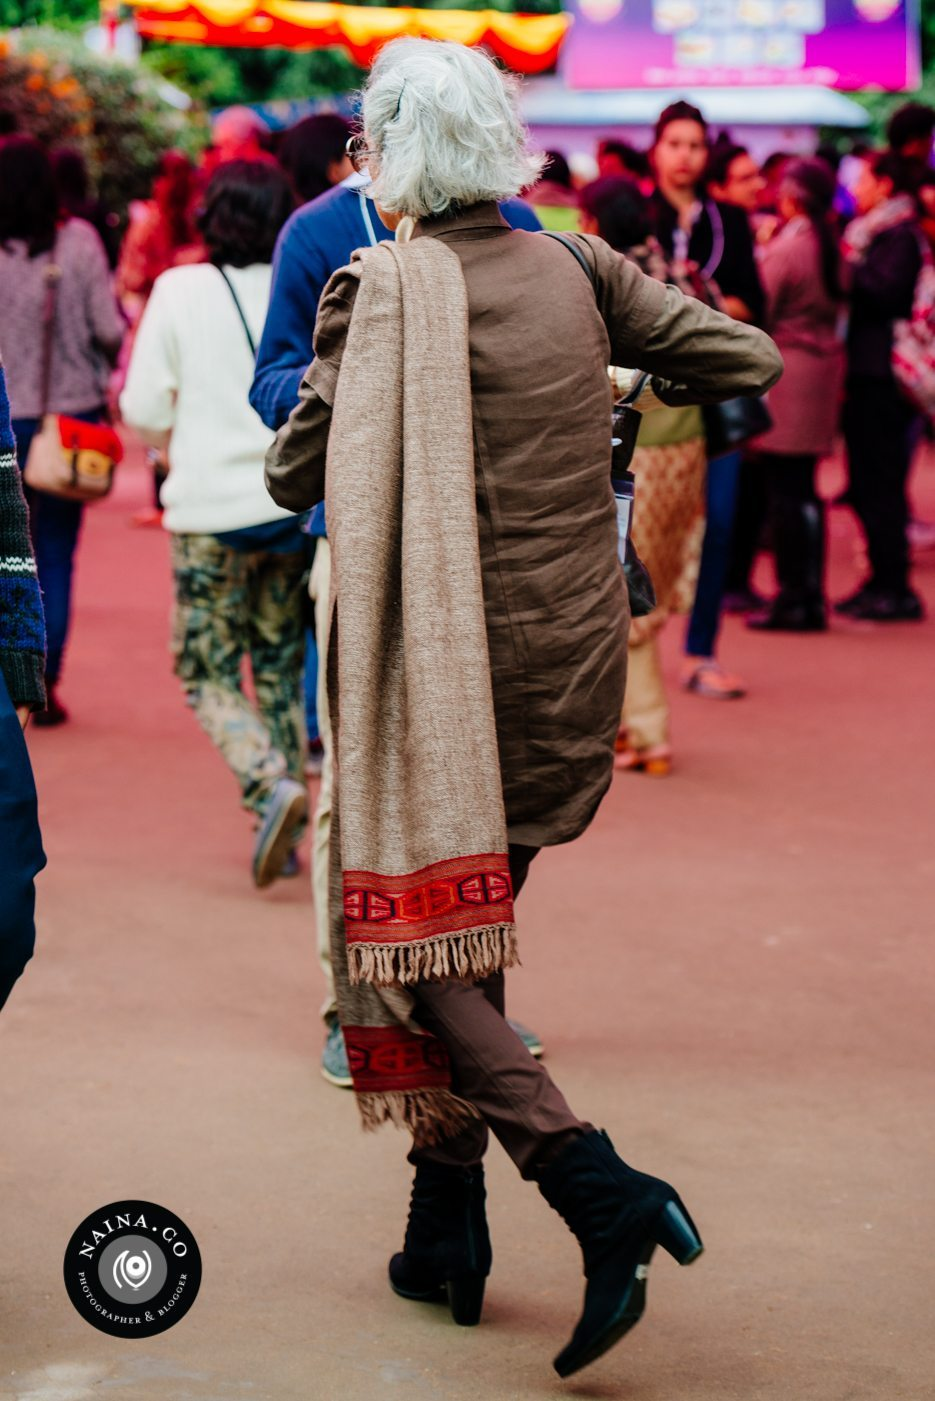 Naina.co-Raconteuse-Visuelle-Photographer-Blogger-Storyteller-Luxury-Lifestyle-January-2015-Jaipur-Literature-Festival-StRegis-LeMeridien-ZeeJLF-EyesForStreetStyle-21